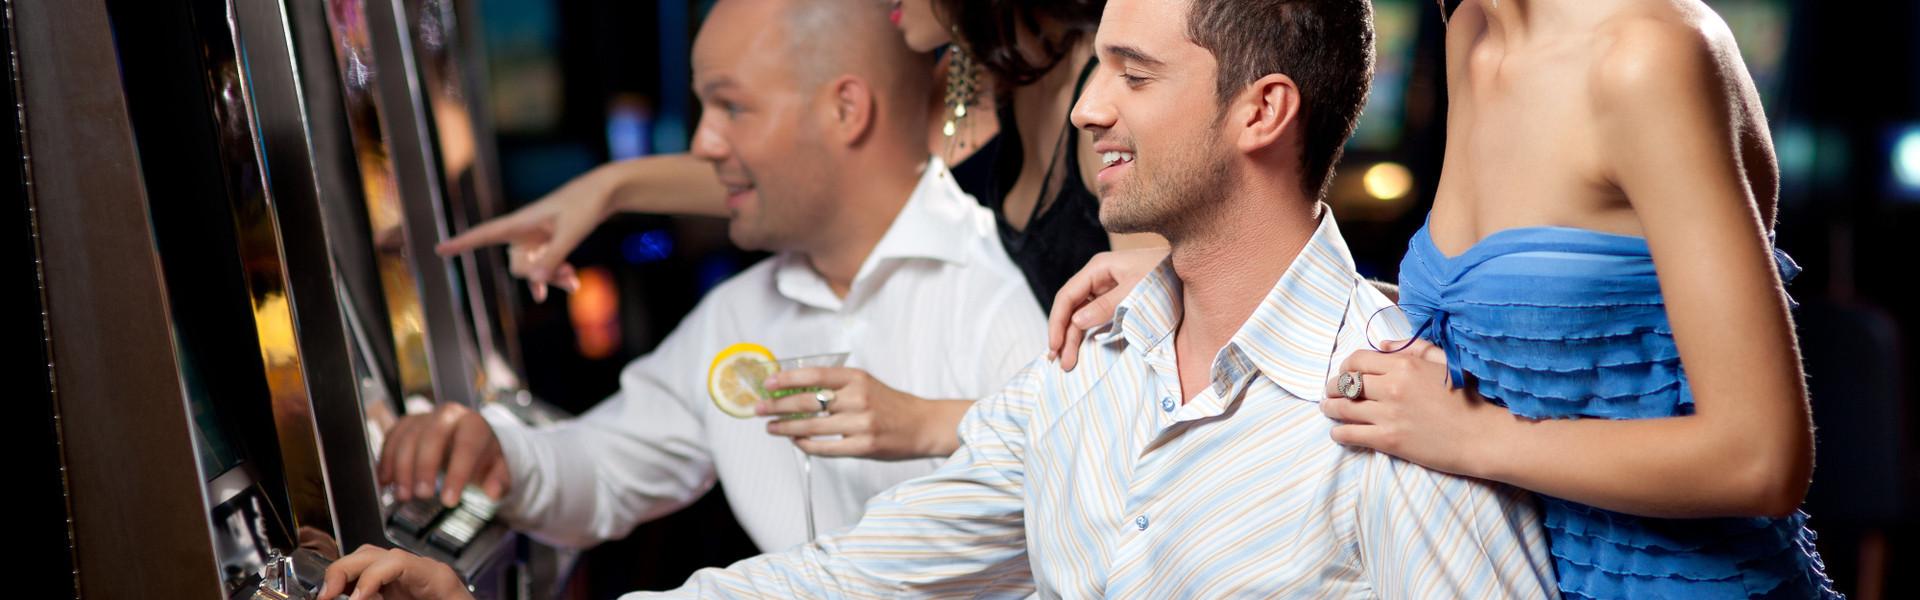 The Best Selection of Slots & Video Poker in Las Vegas NV | Westgate Las Vegas Resort & Casino